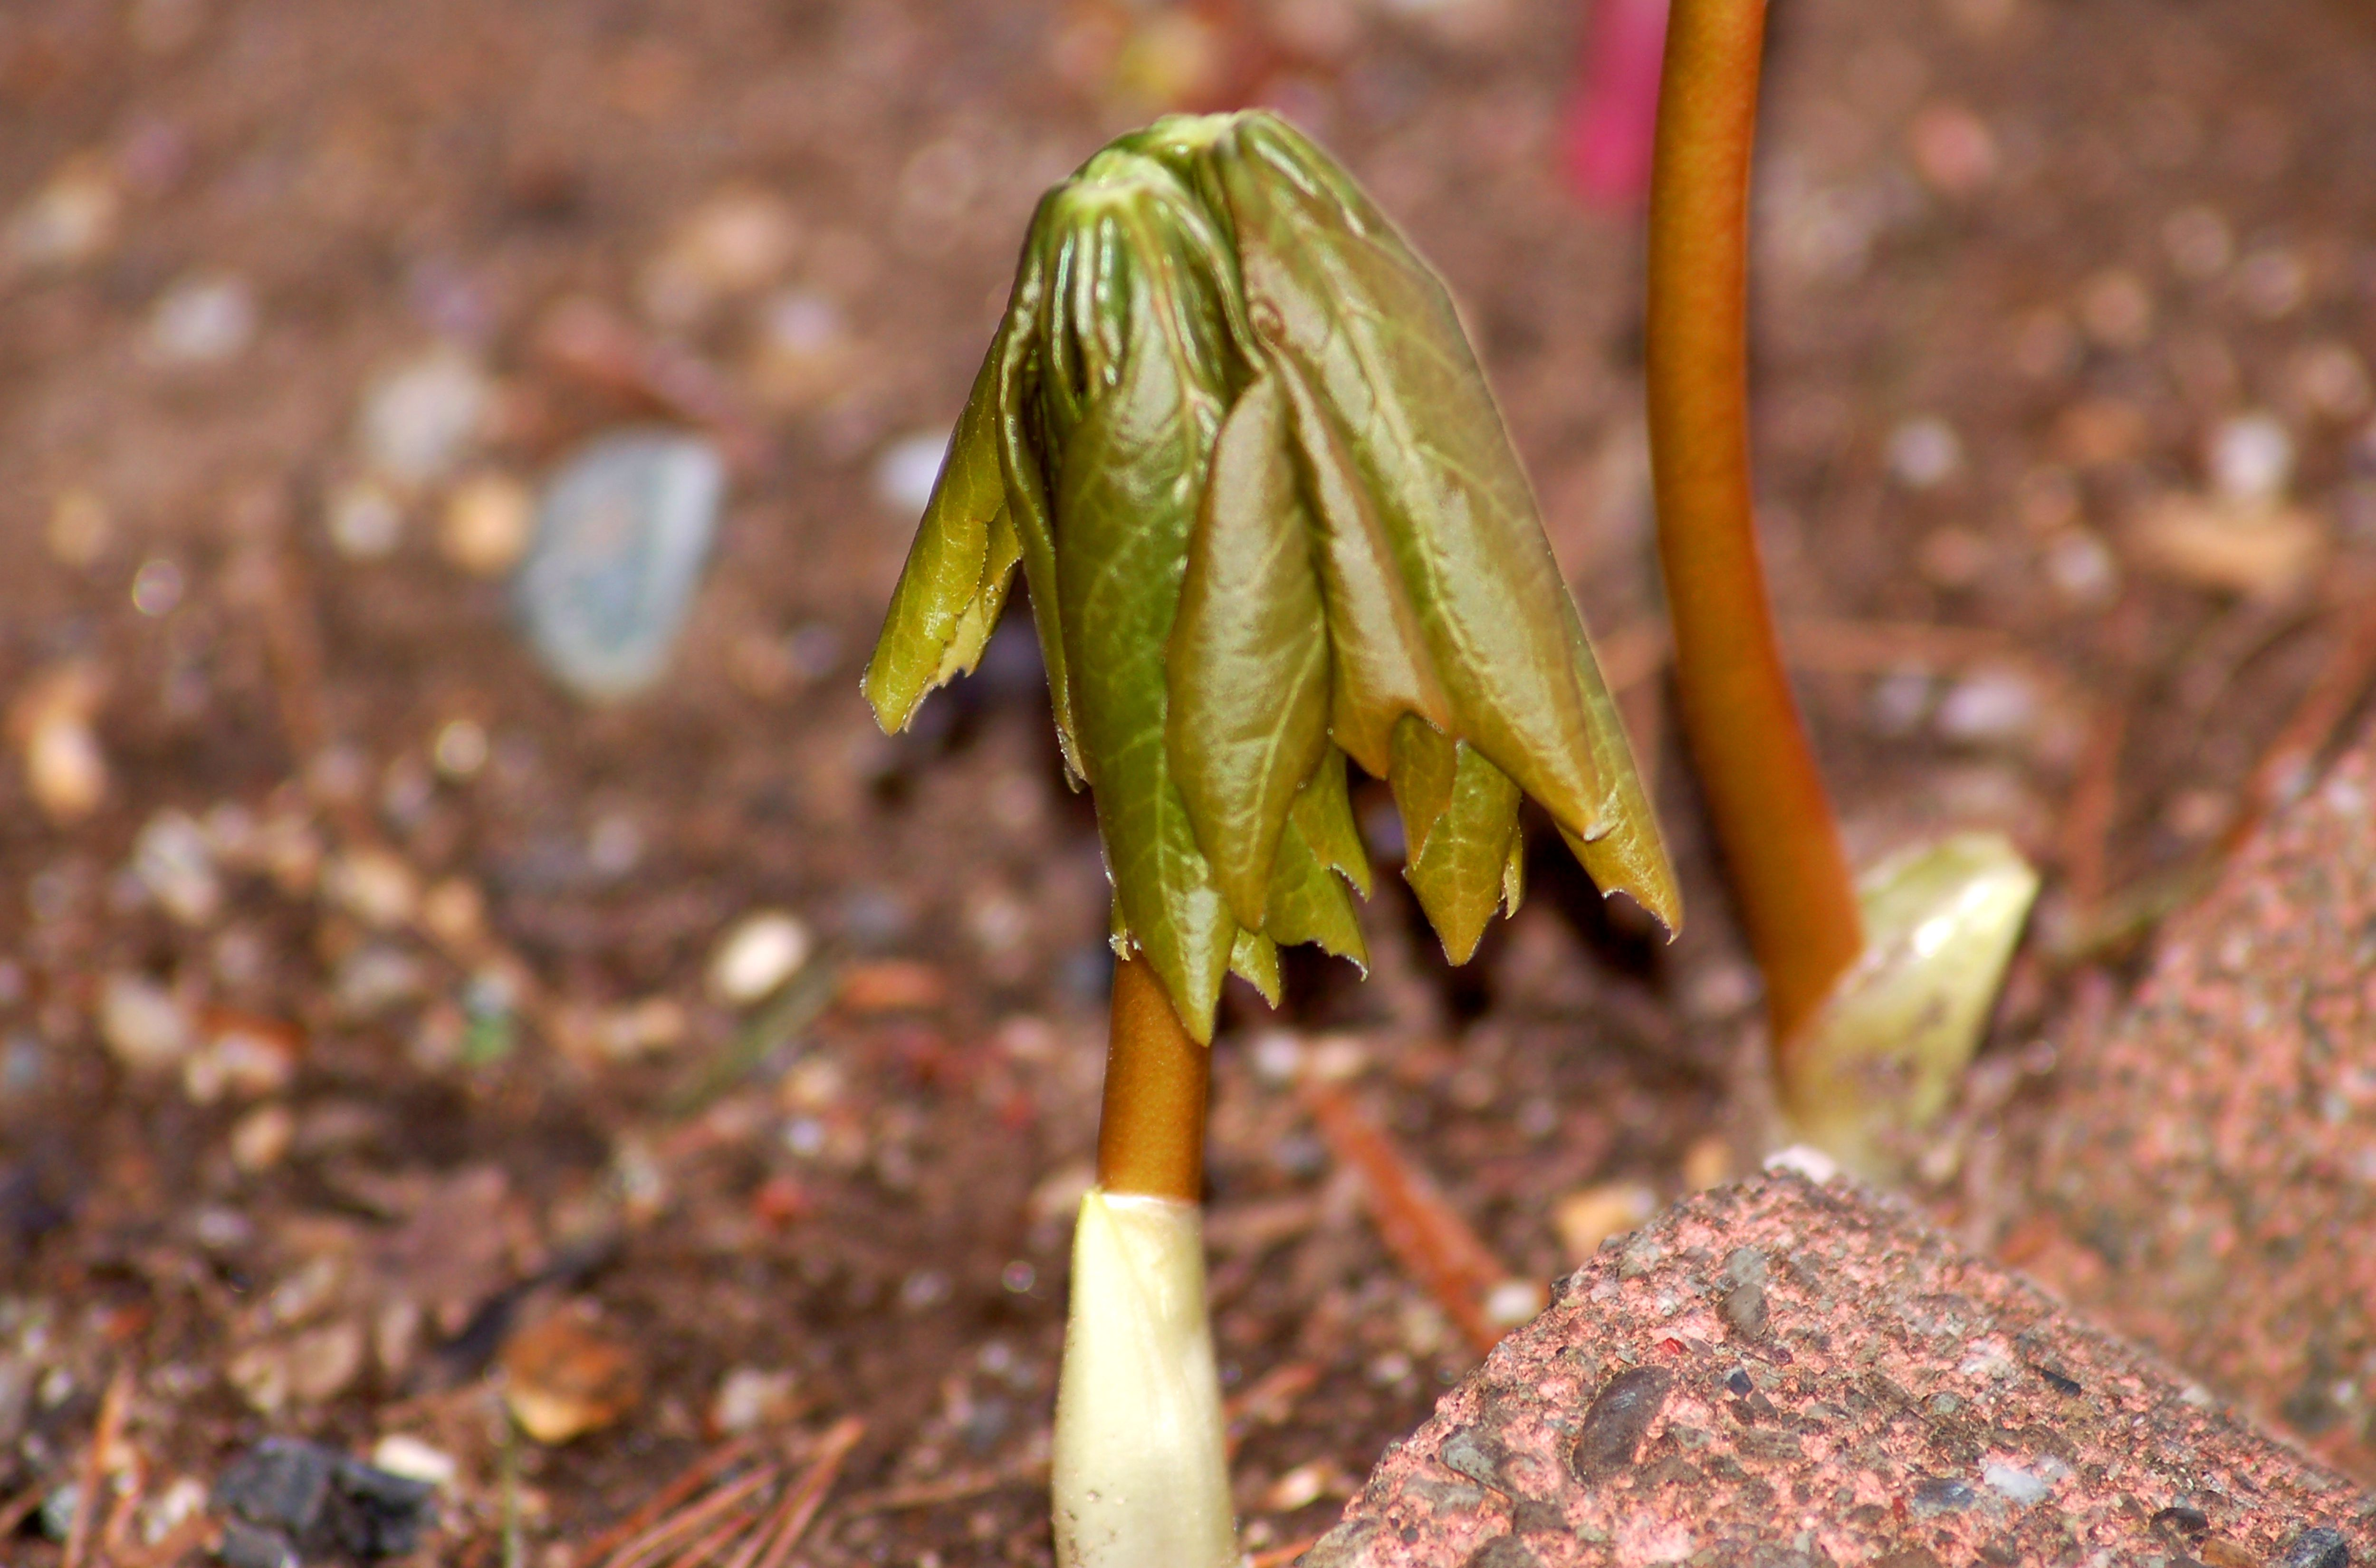 mayapple leaves unfurling